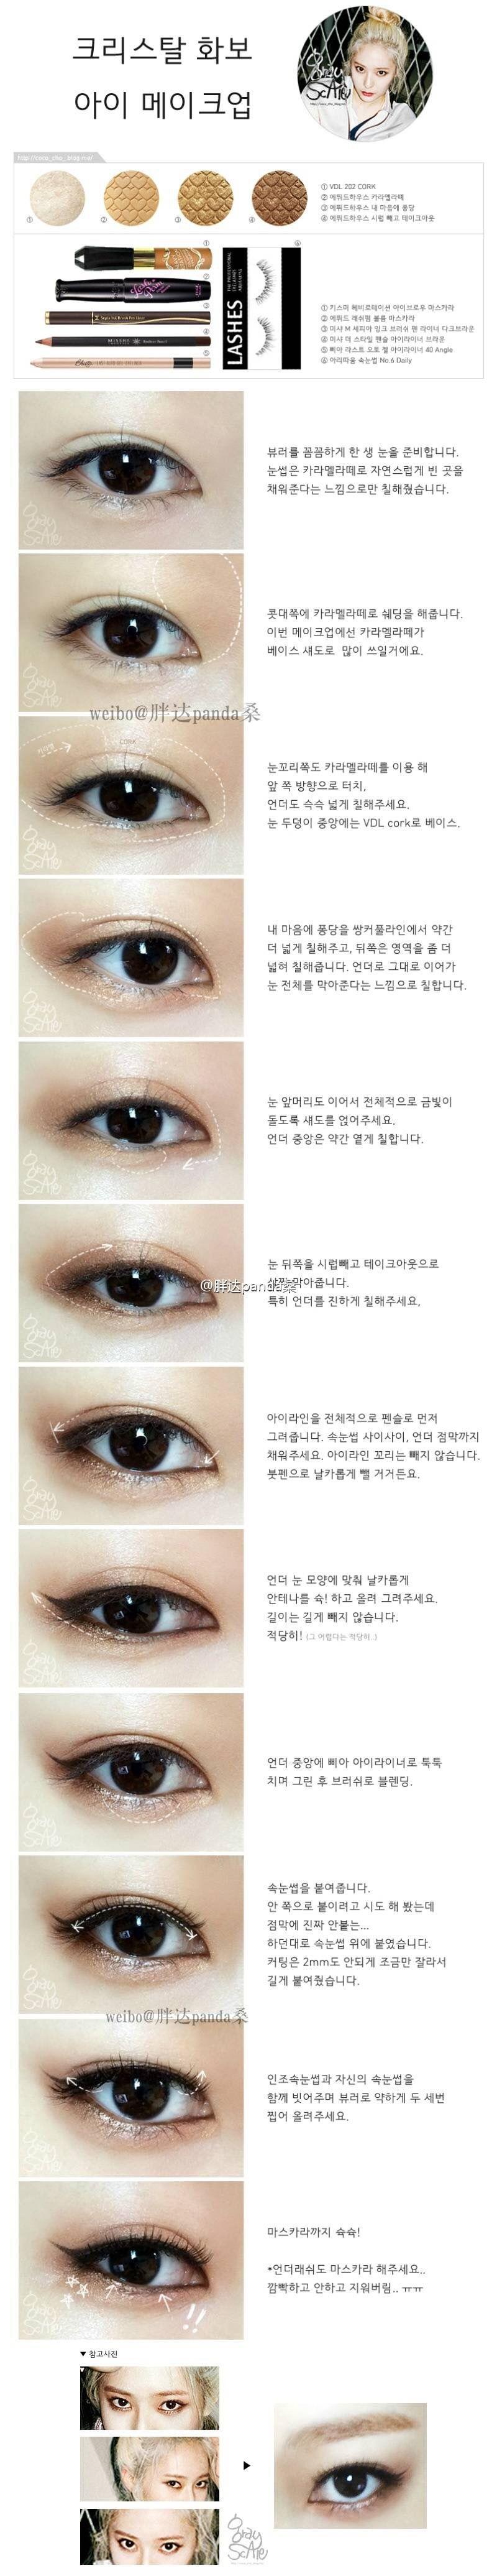 F X Krystal Red Light Korean Kpop Idol Makeup Tutorial Cr Coco Cho Blog Me Korean Eye Makeup Asian Eye Makeup Korean Makeup Tips